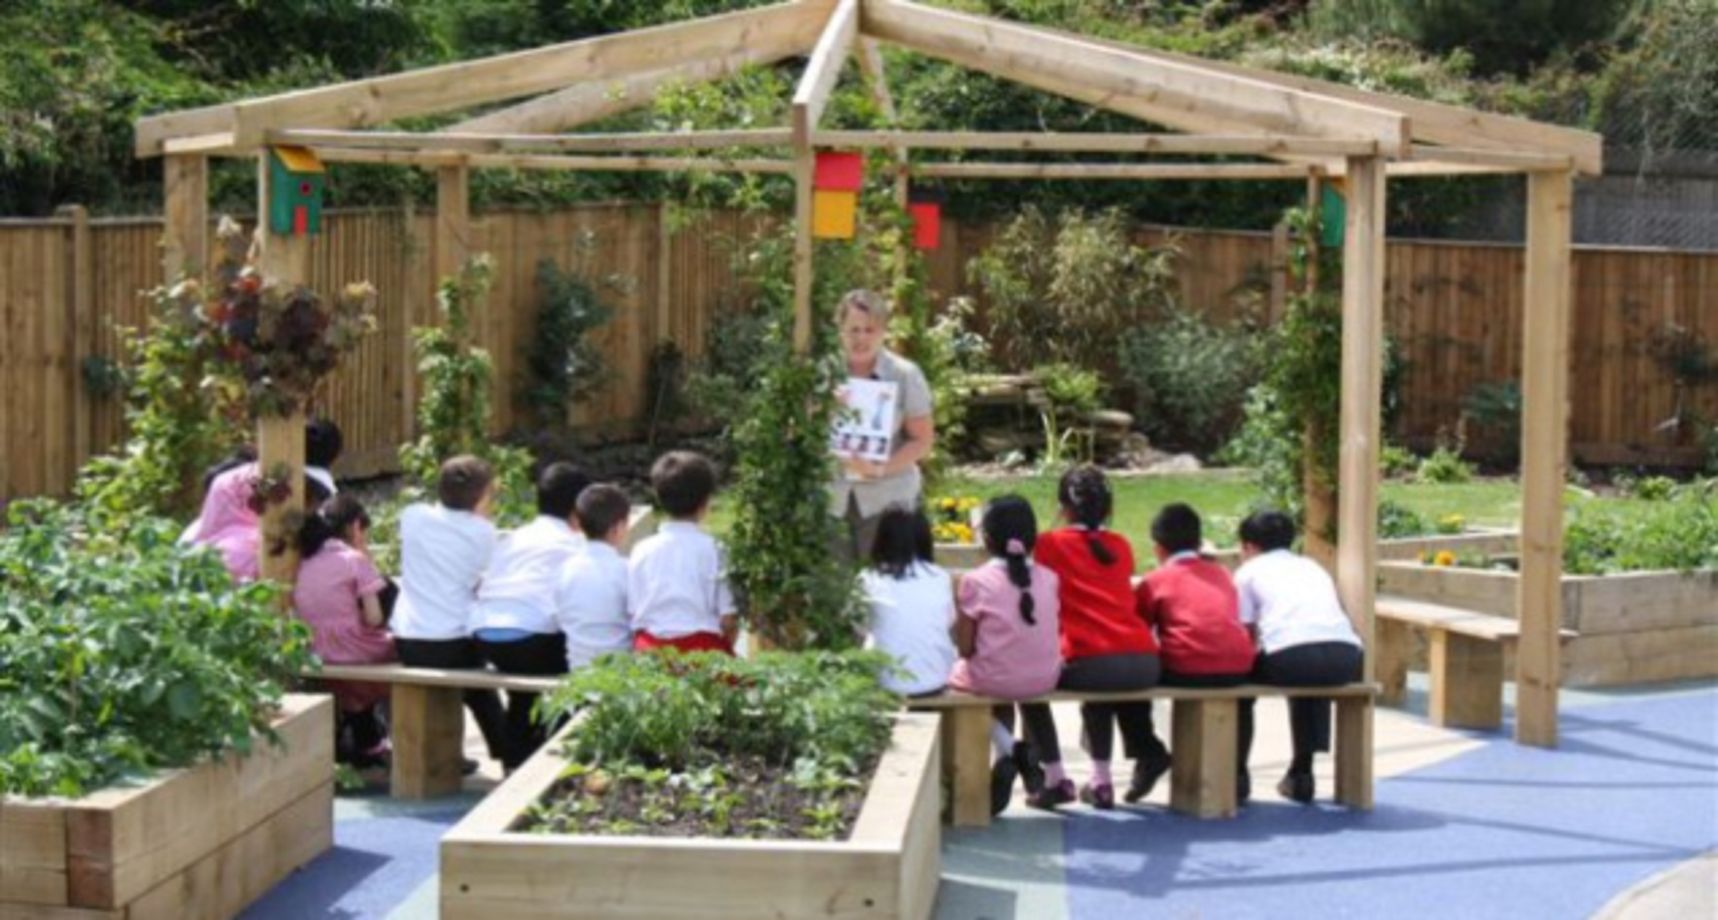 35 Cute and Simple School Garden Design Ideas